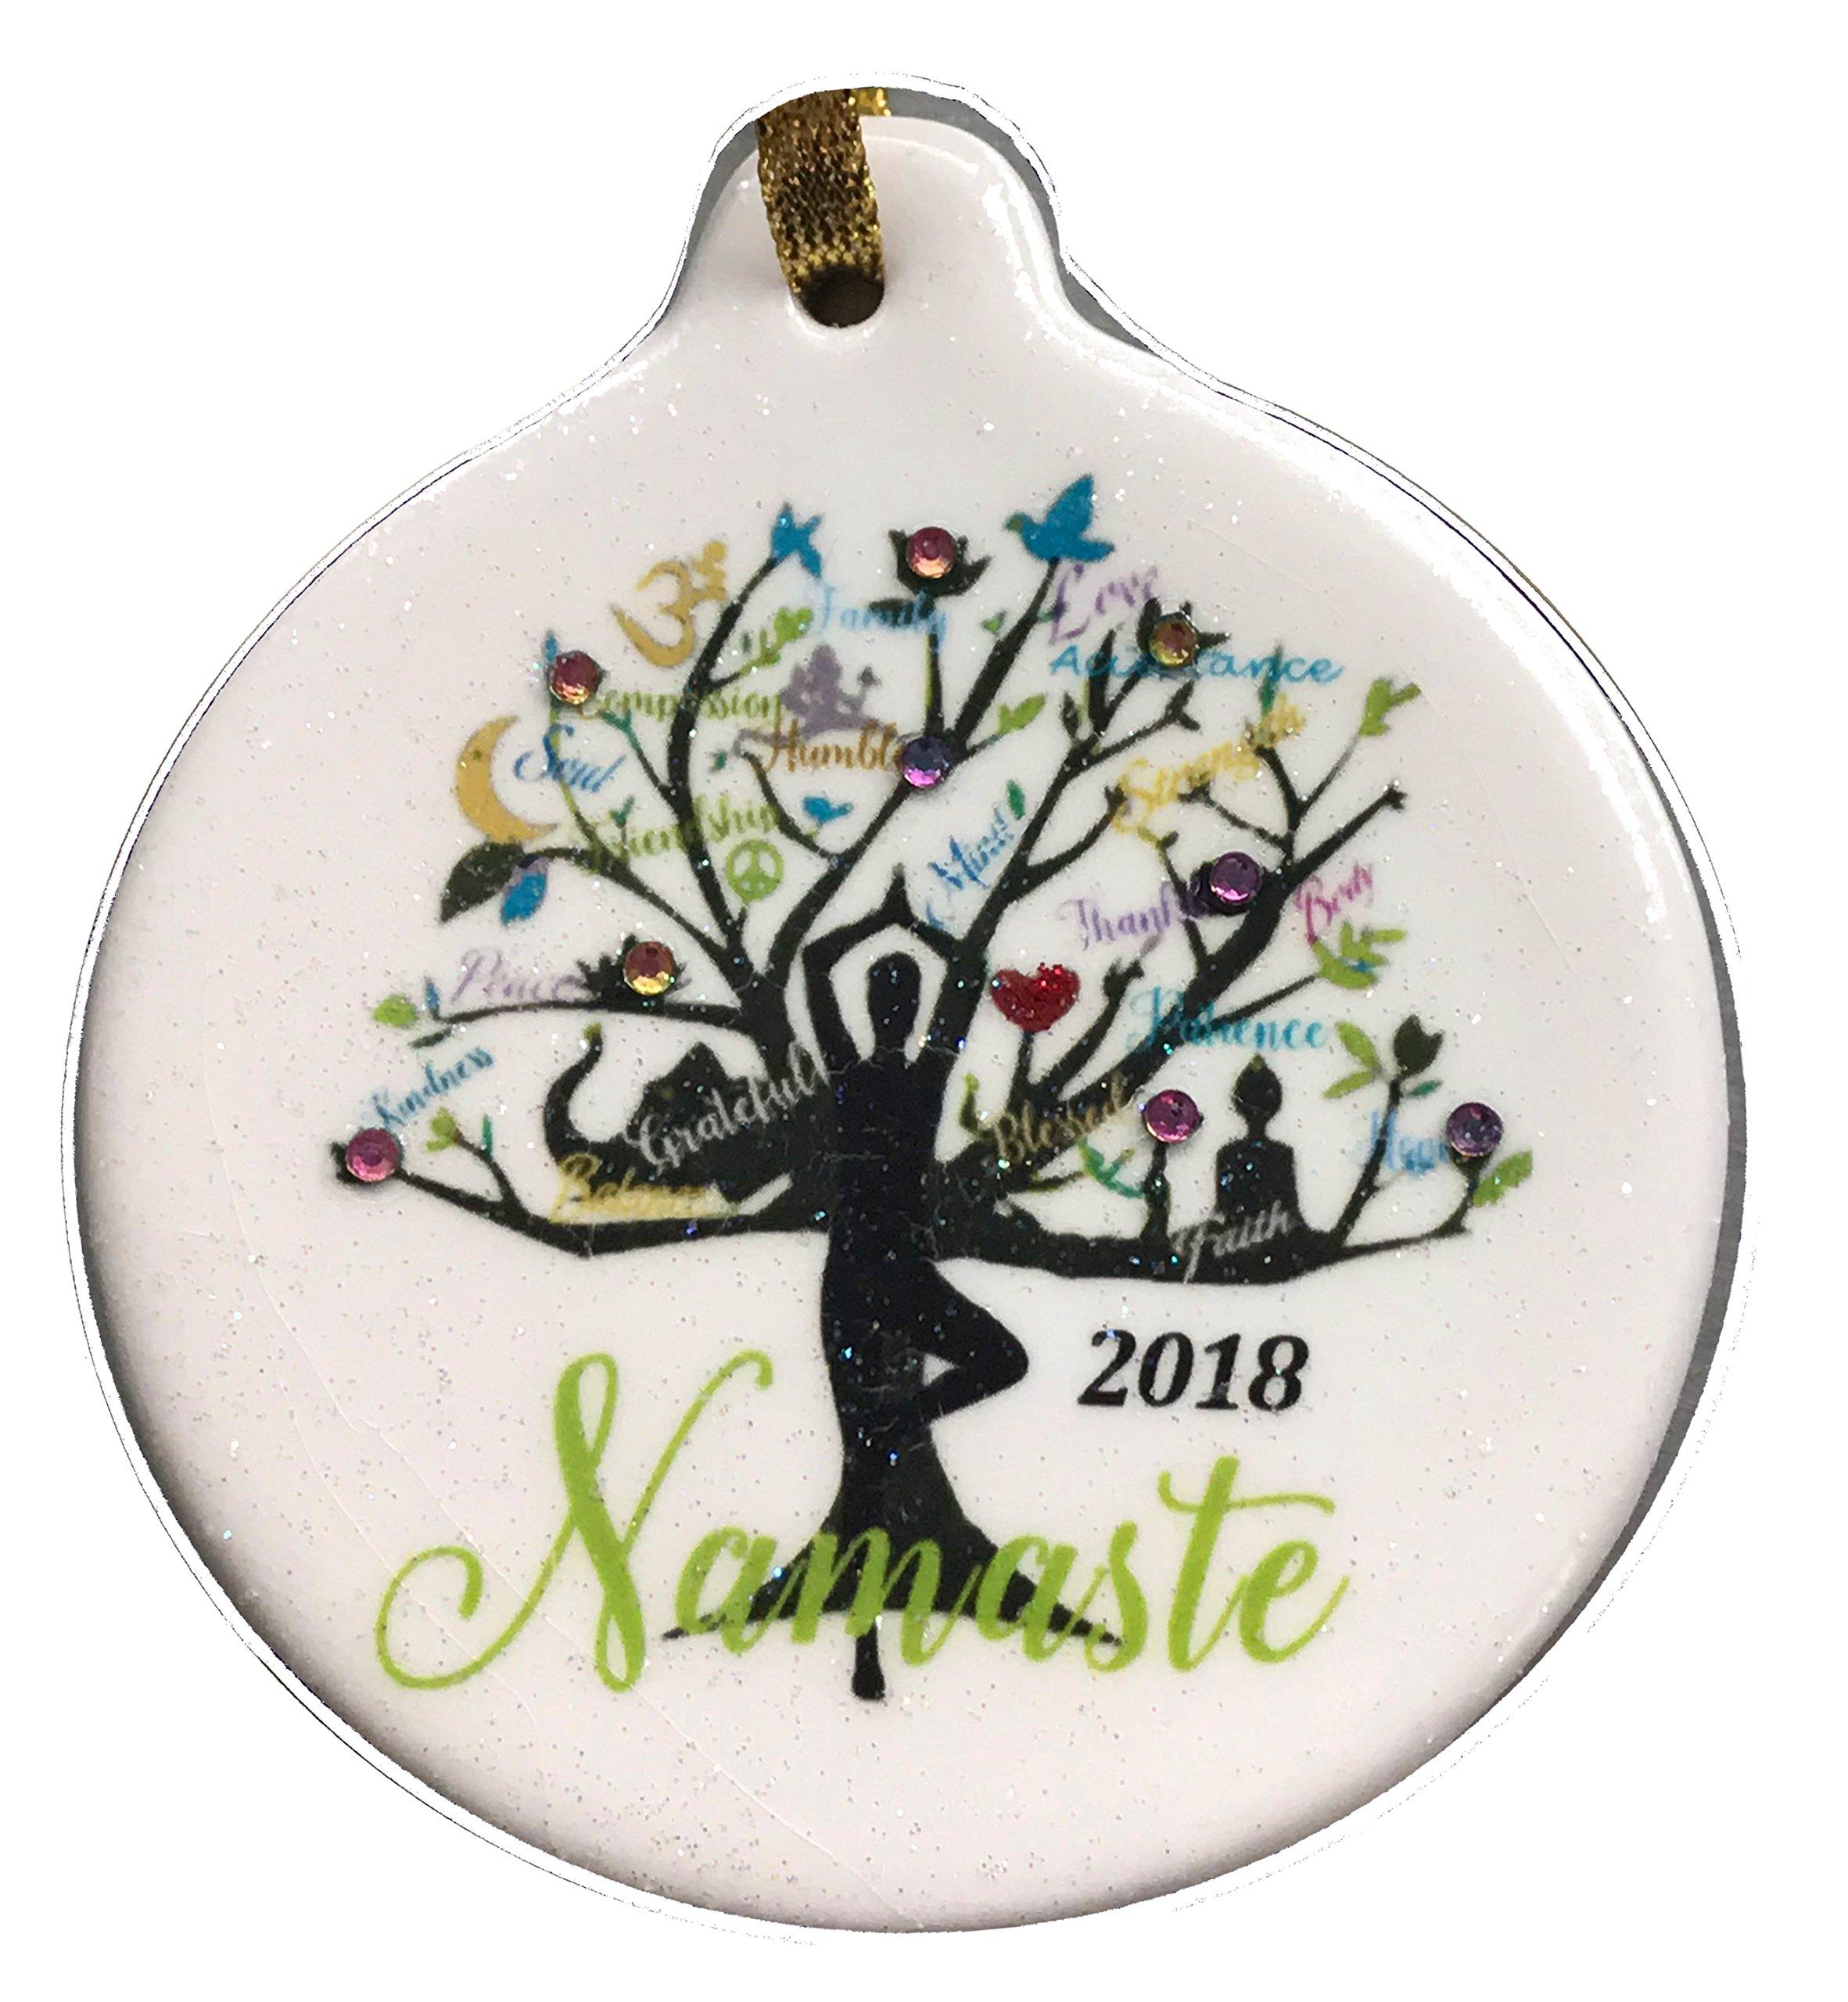 Yoga Tree Namaste 2018 Porcelain Gift Ornament Life Faith Love Peace Family Rhinestone Crystal